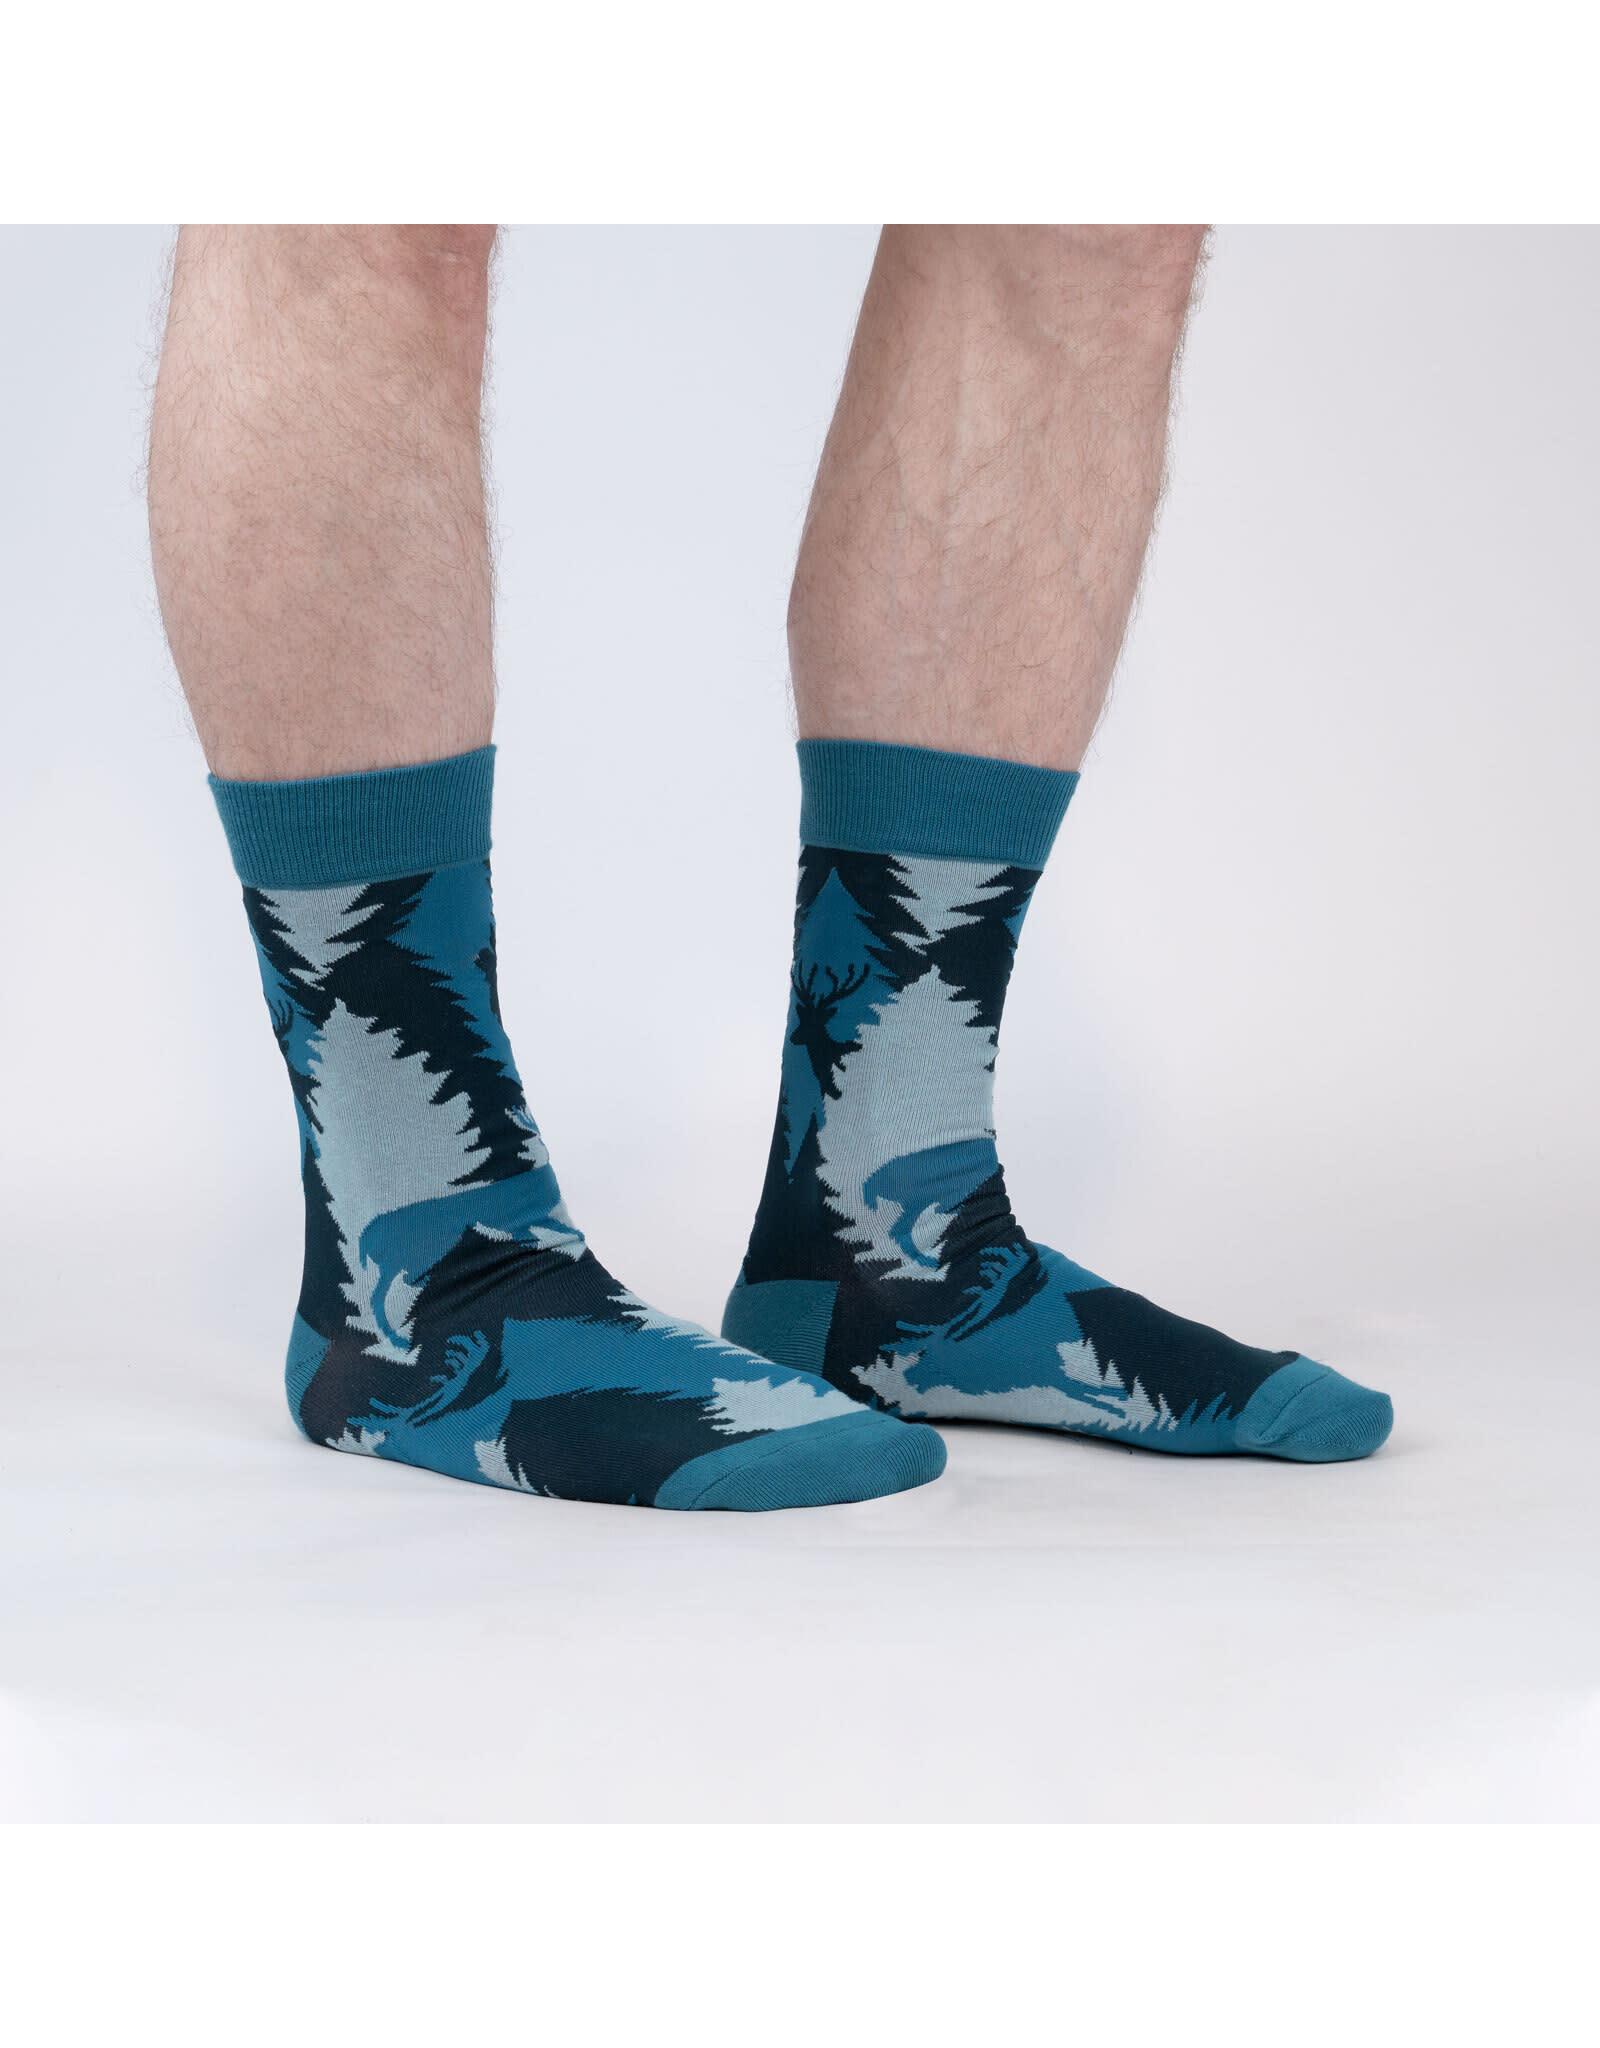 SOCK IT TO ME Men's Going Stag Crew Socks